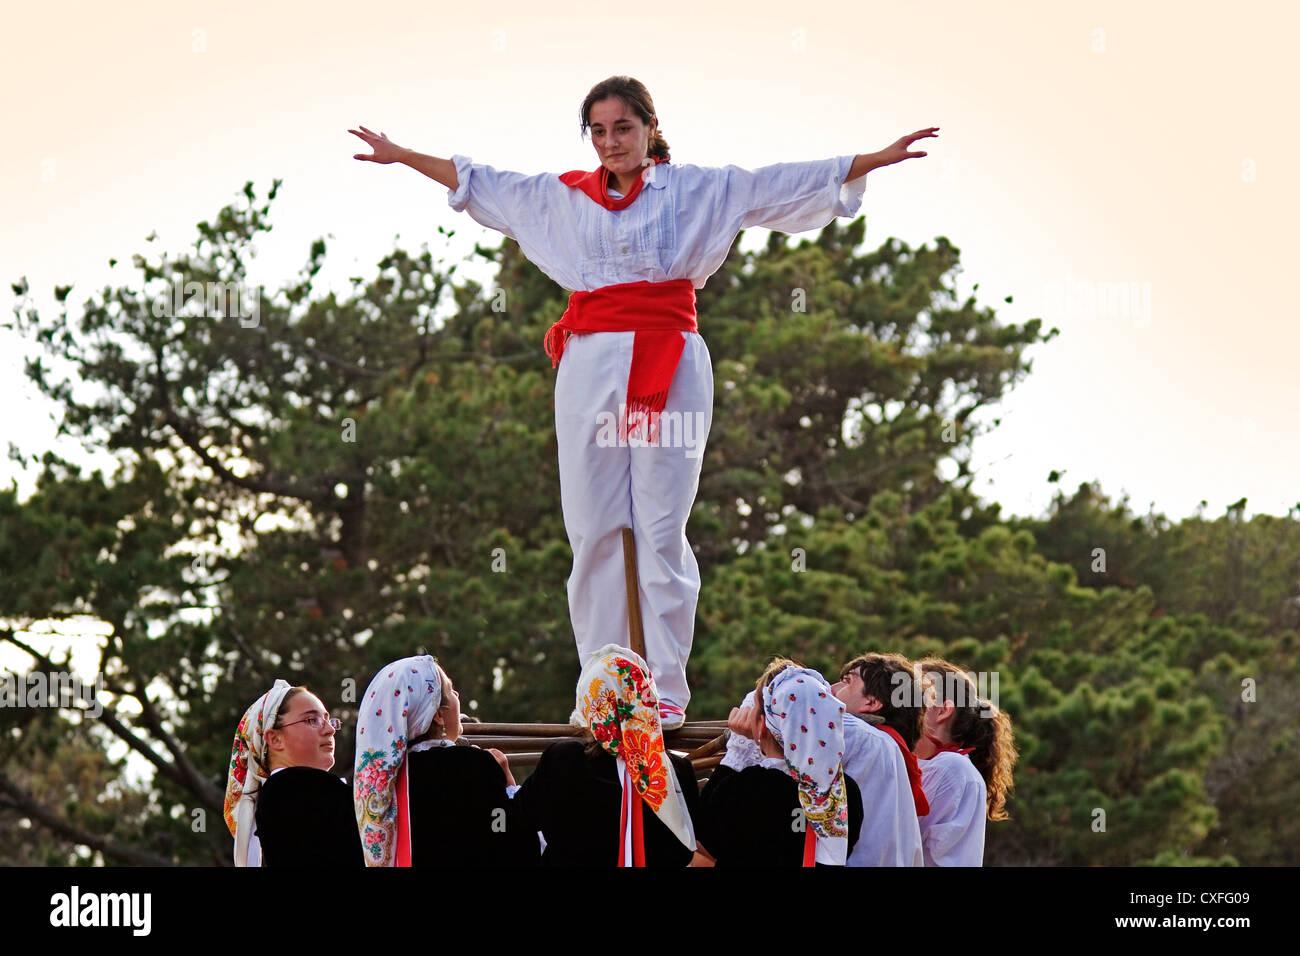 Danza de ibio realizado por un grupo de danza en la peregrinación faro montaña Santander Cantabria España Imagen De Stock